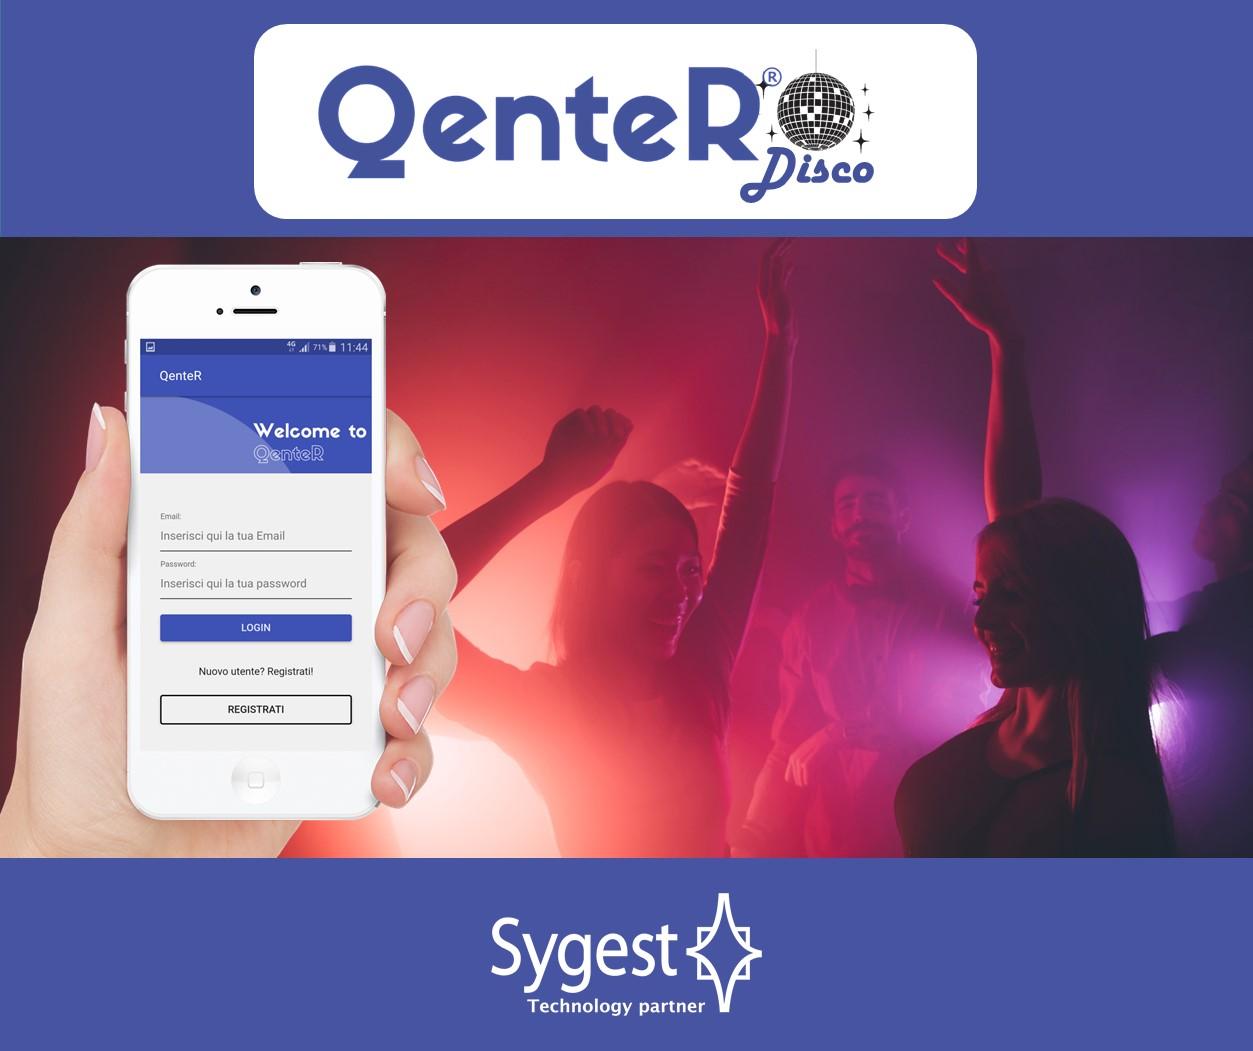 QenteR Disco - App prenotazione discoteca | Sygest Srl